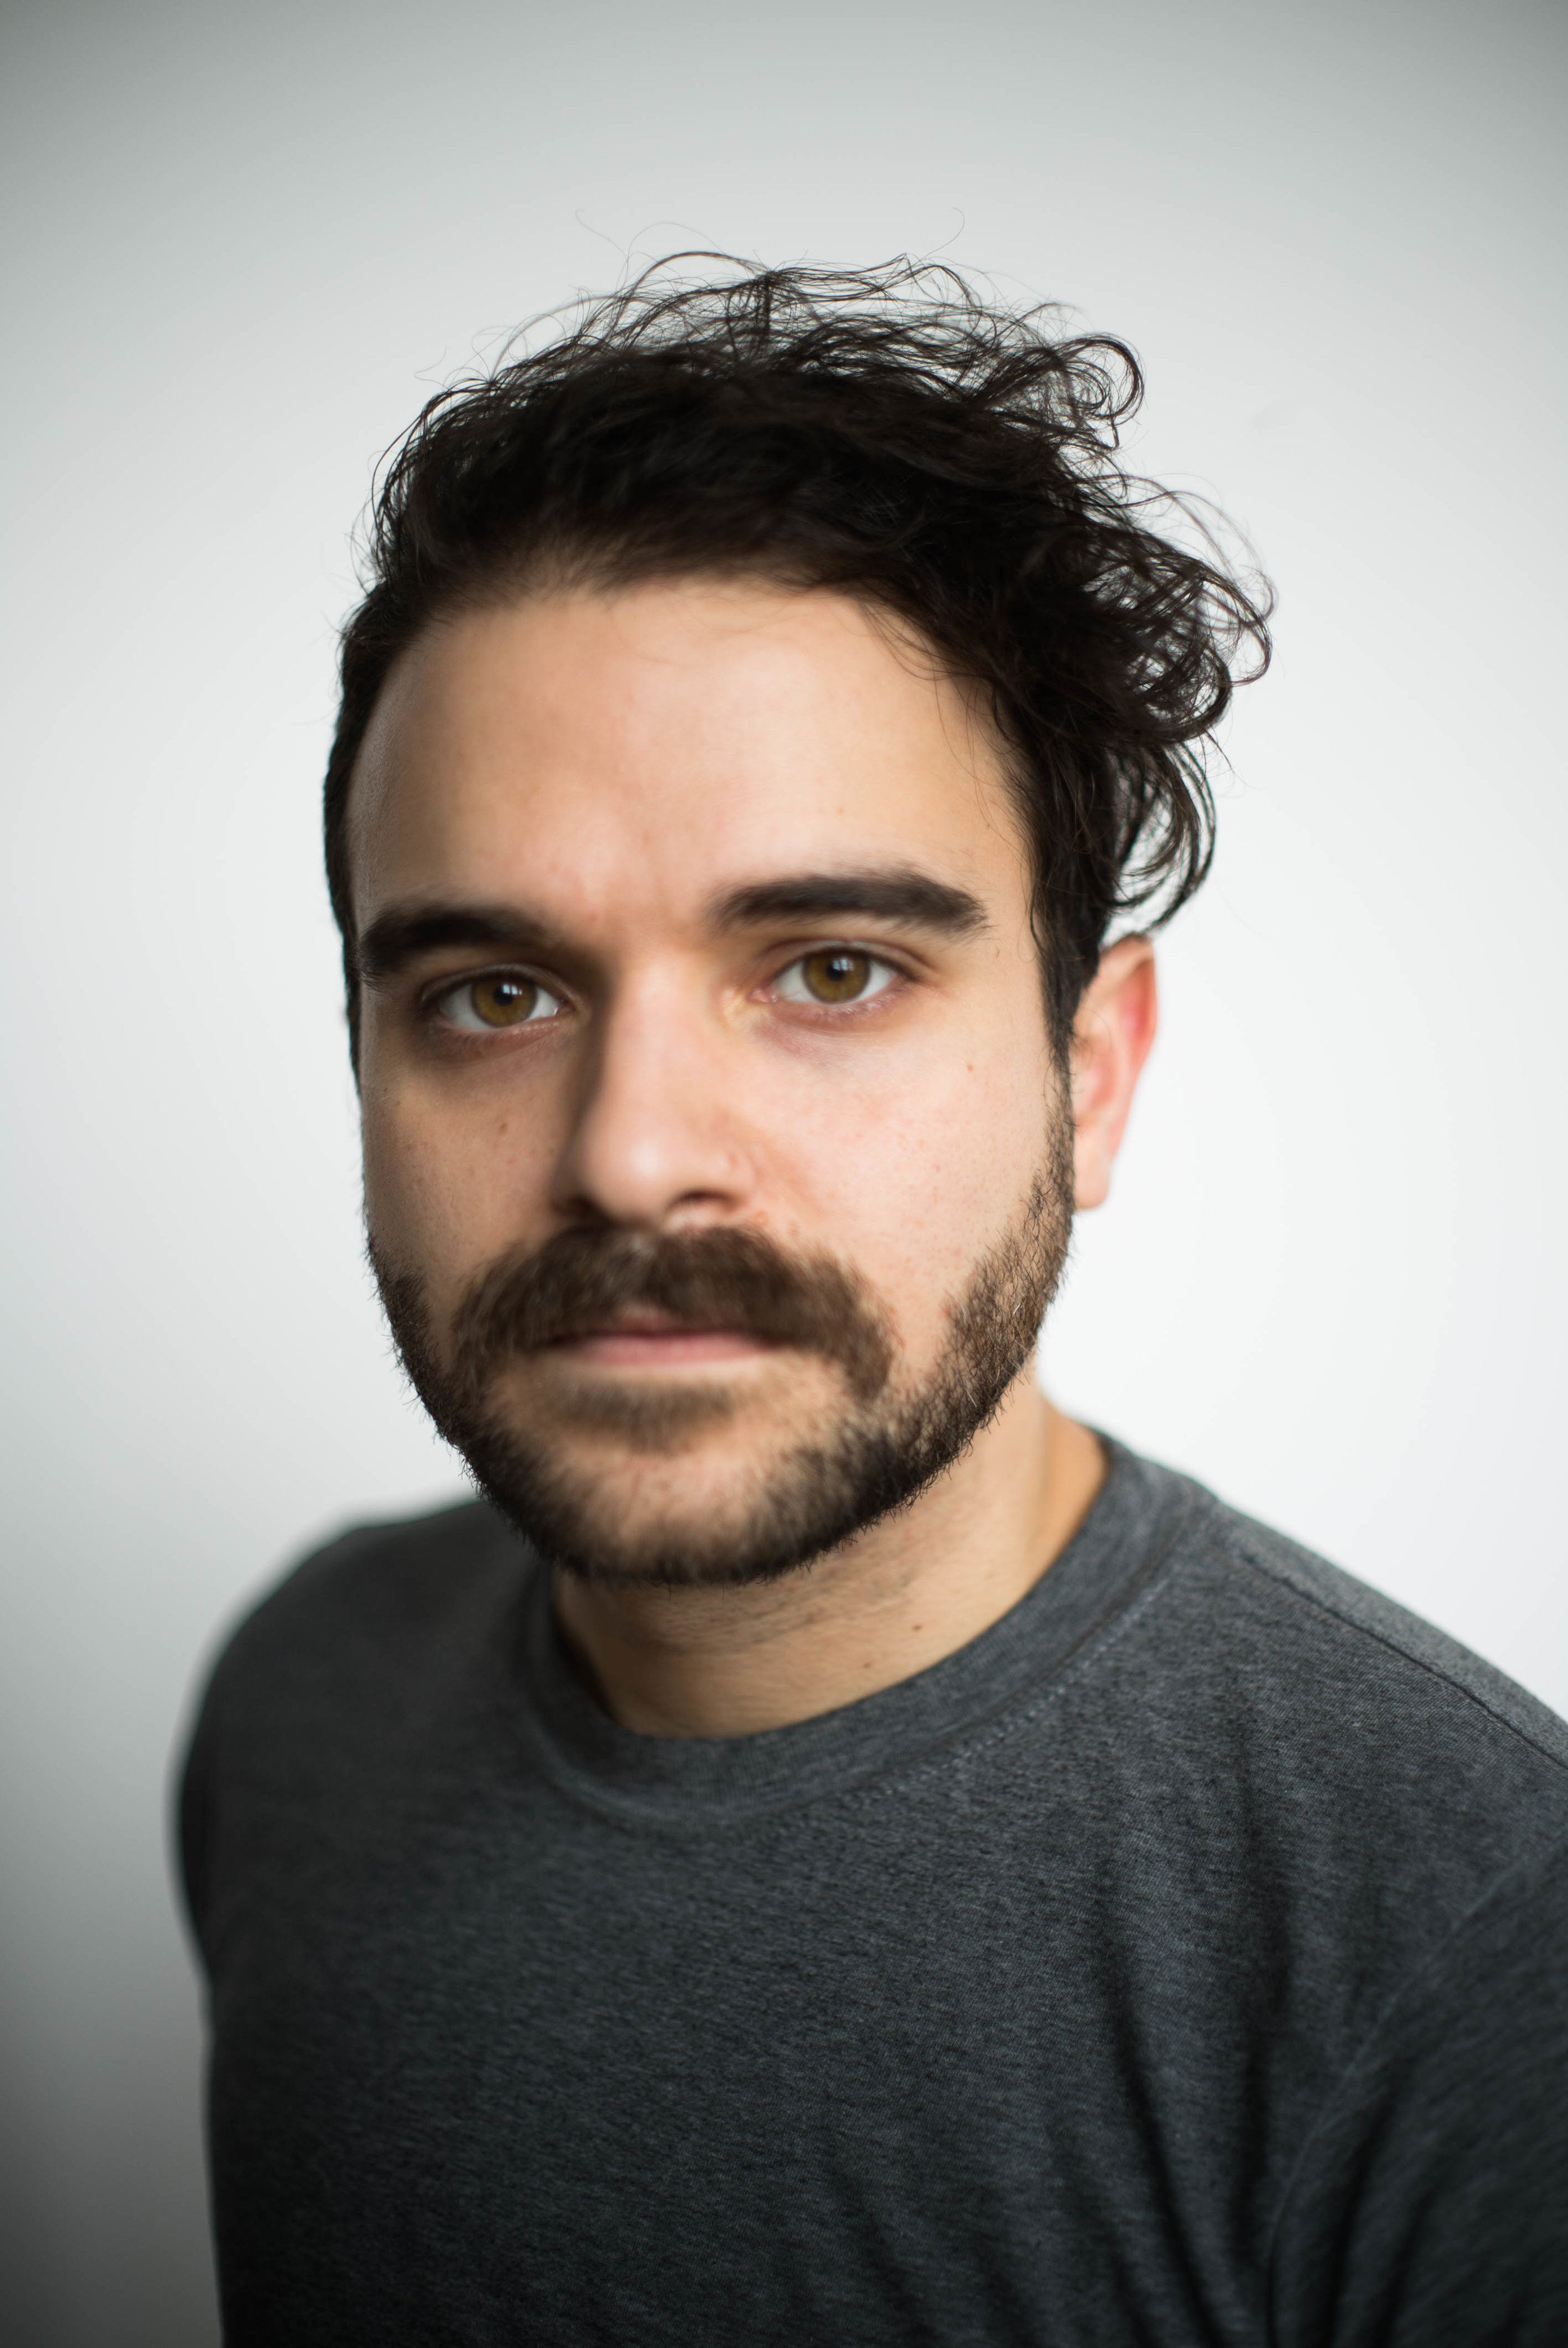 Stage Manager Giuseppe Condello